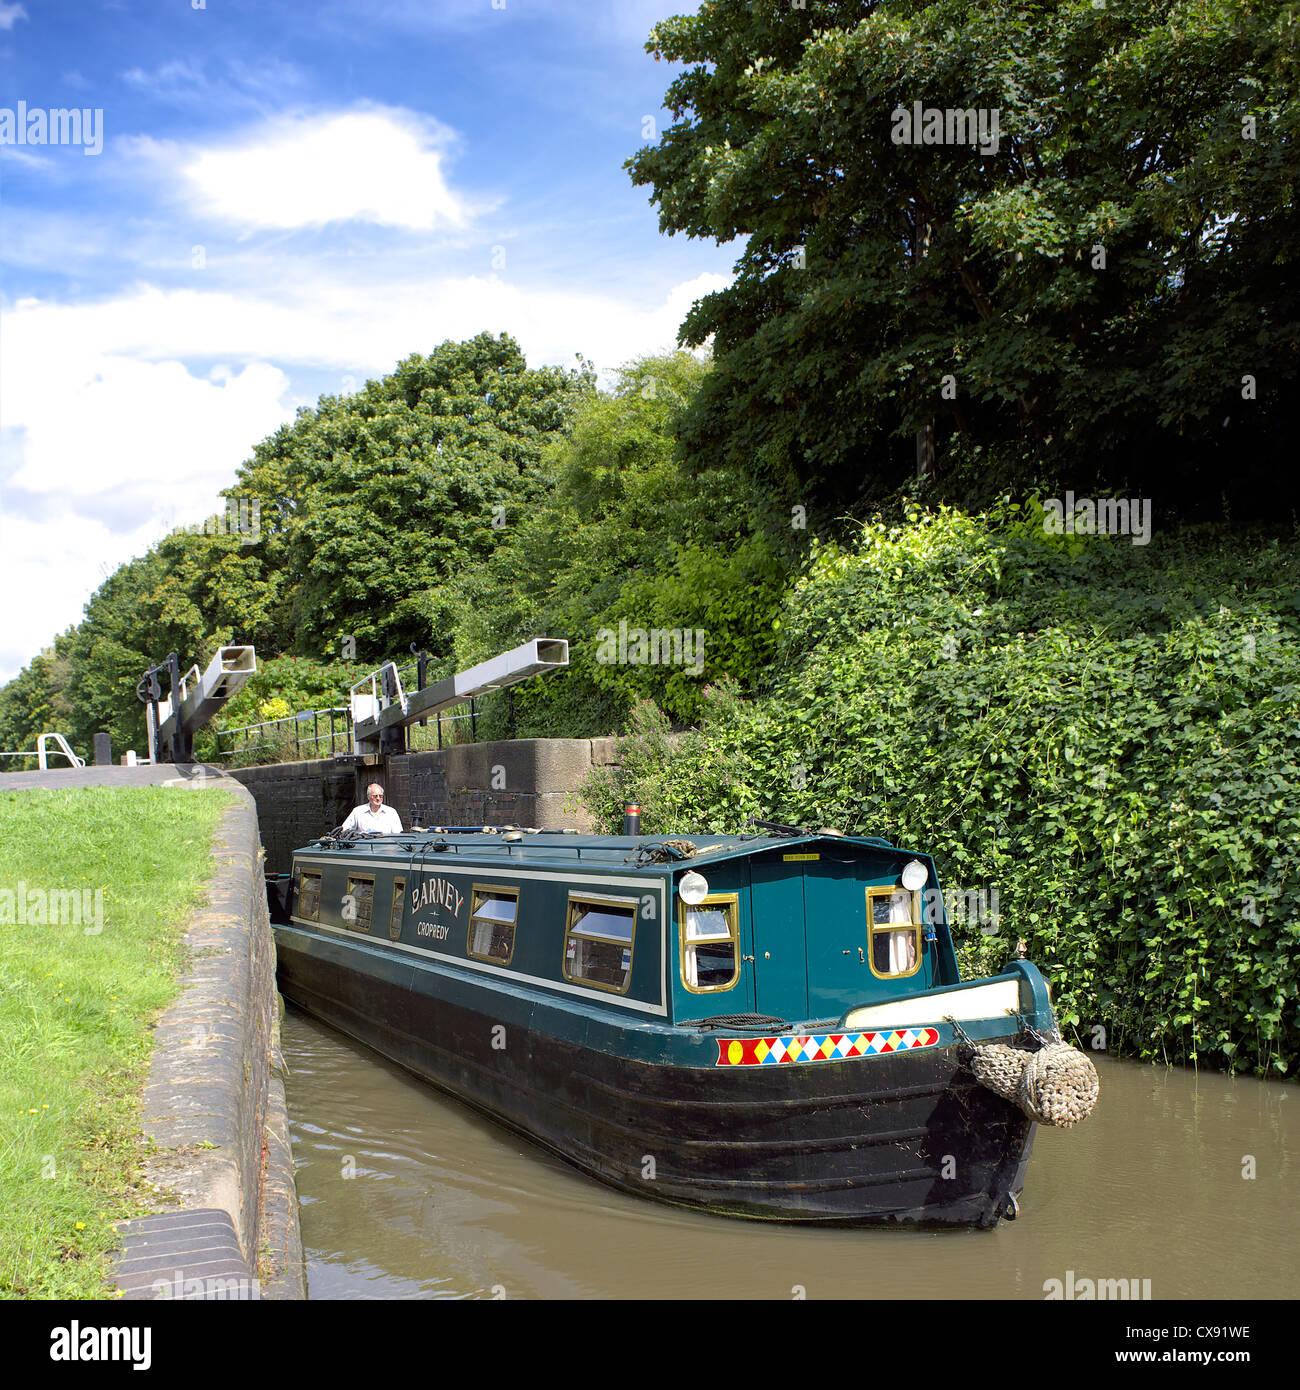 Narrowboat using Glascote Locks on the Coventry Canal, Tamworth, Staffordshire, England, UK, England, UK, GB, colourful, - Stock Image